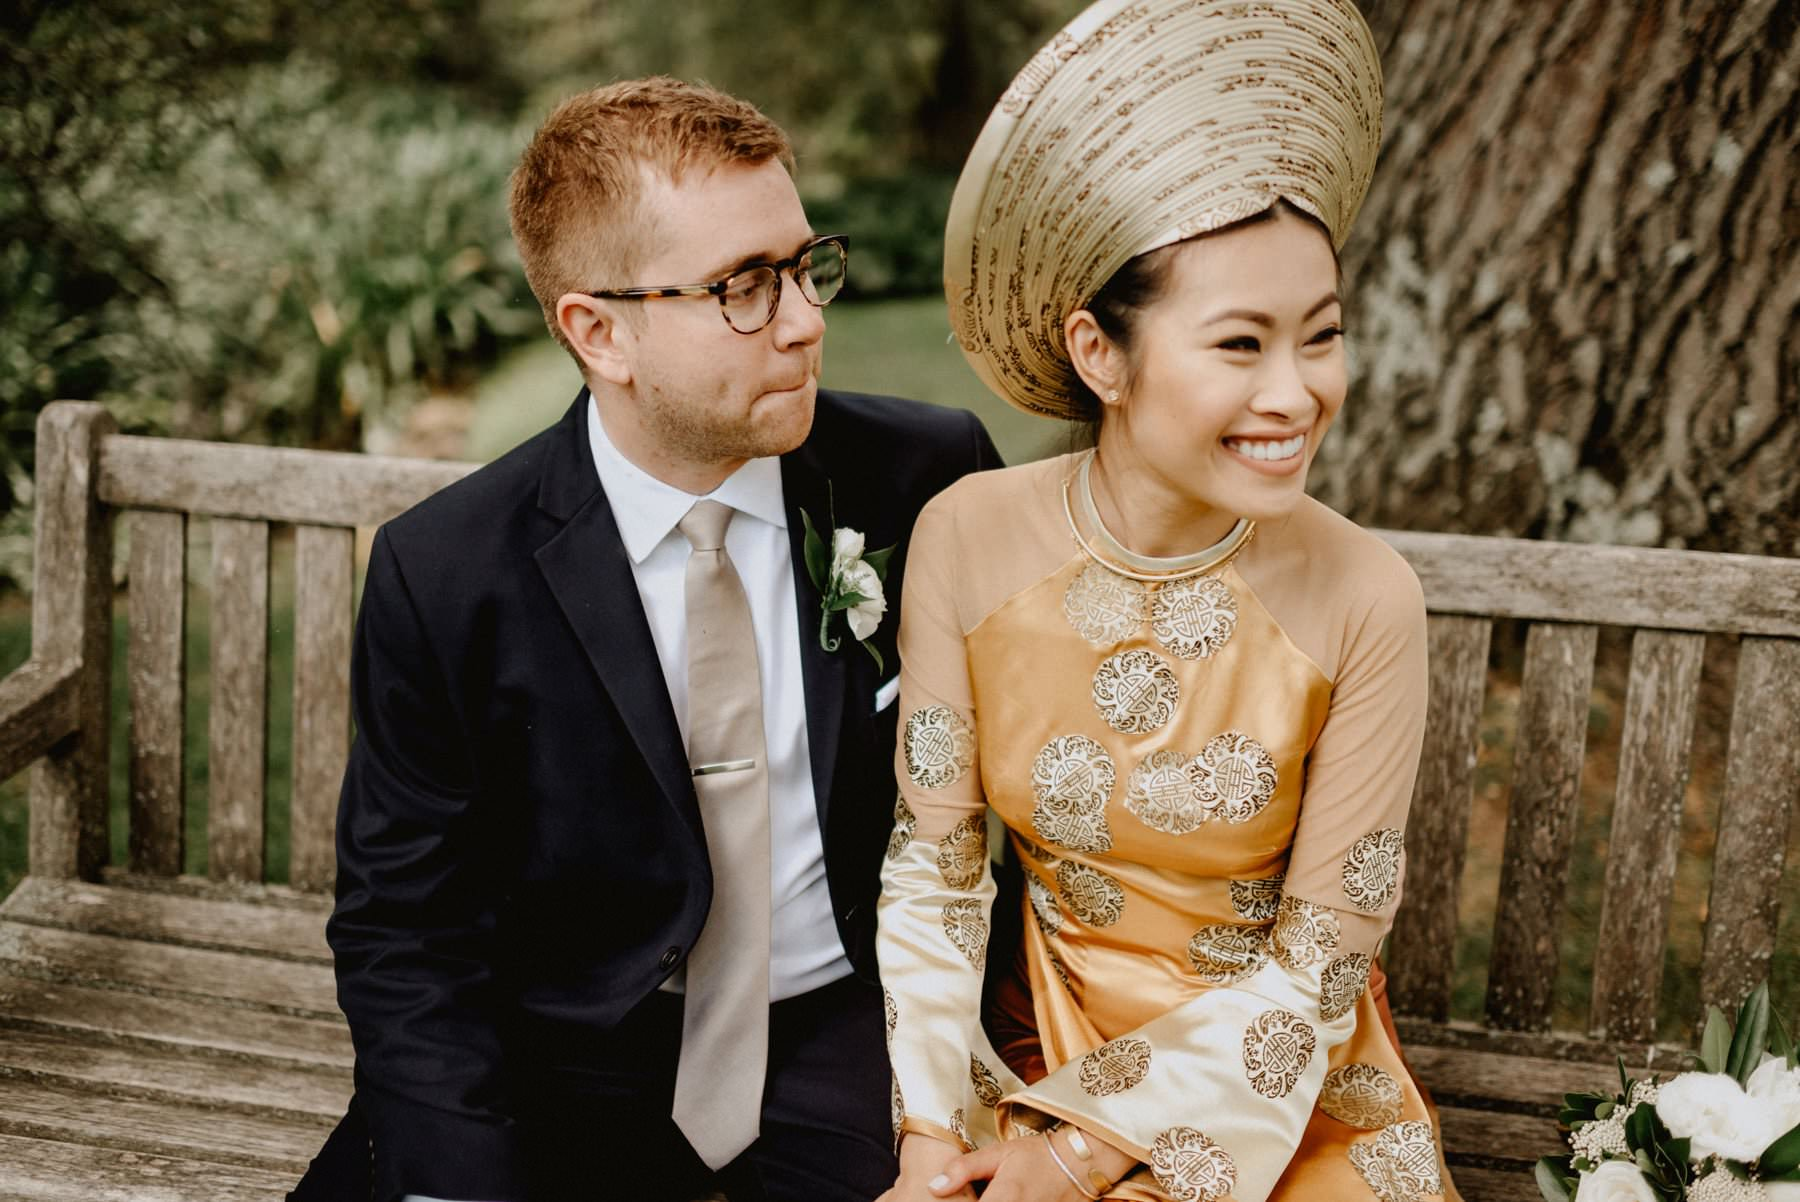 Appleford-estate-wedding-27.jpg